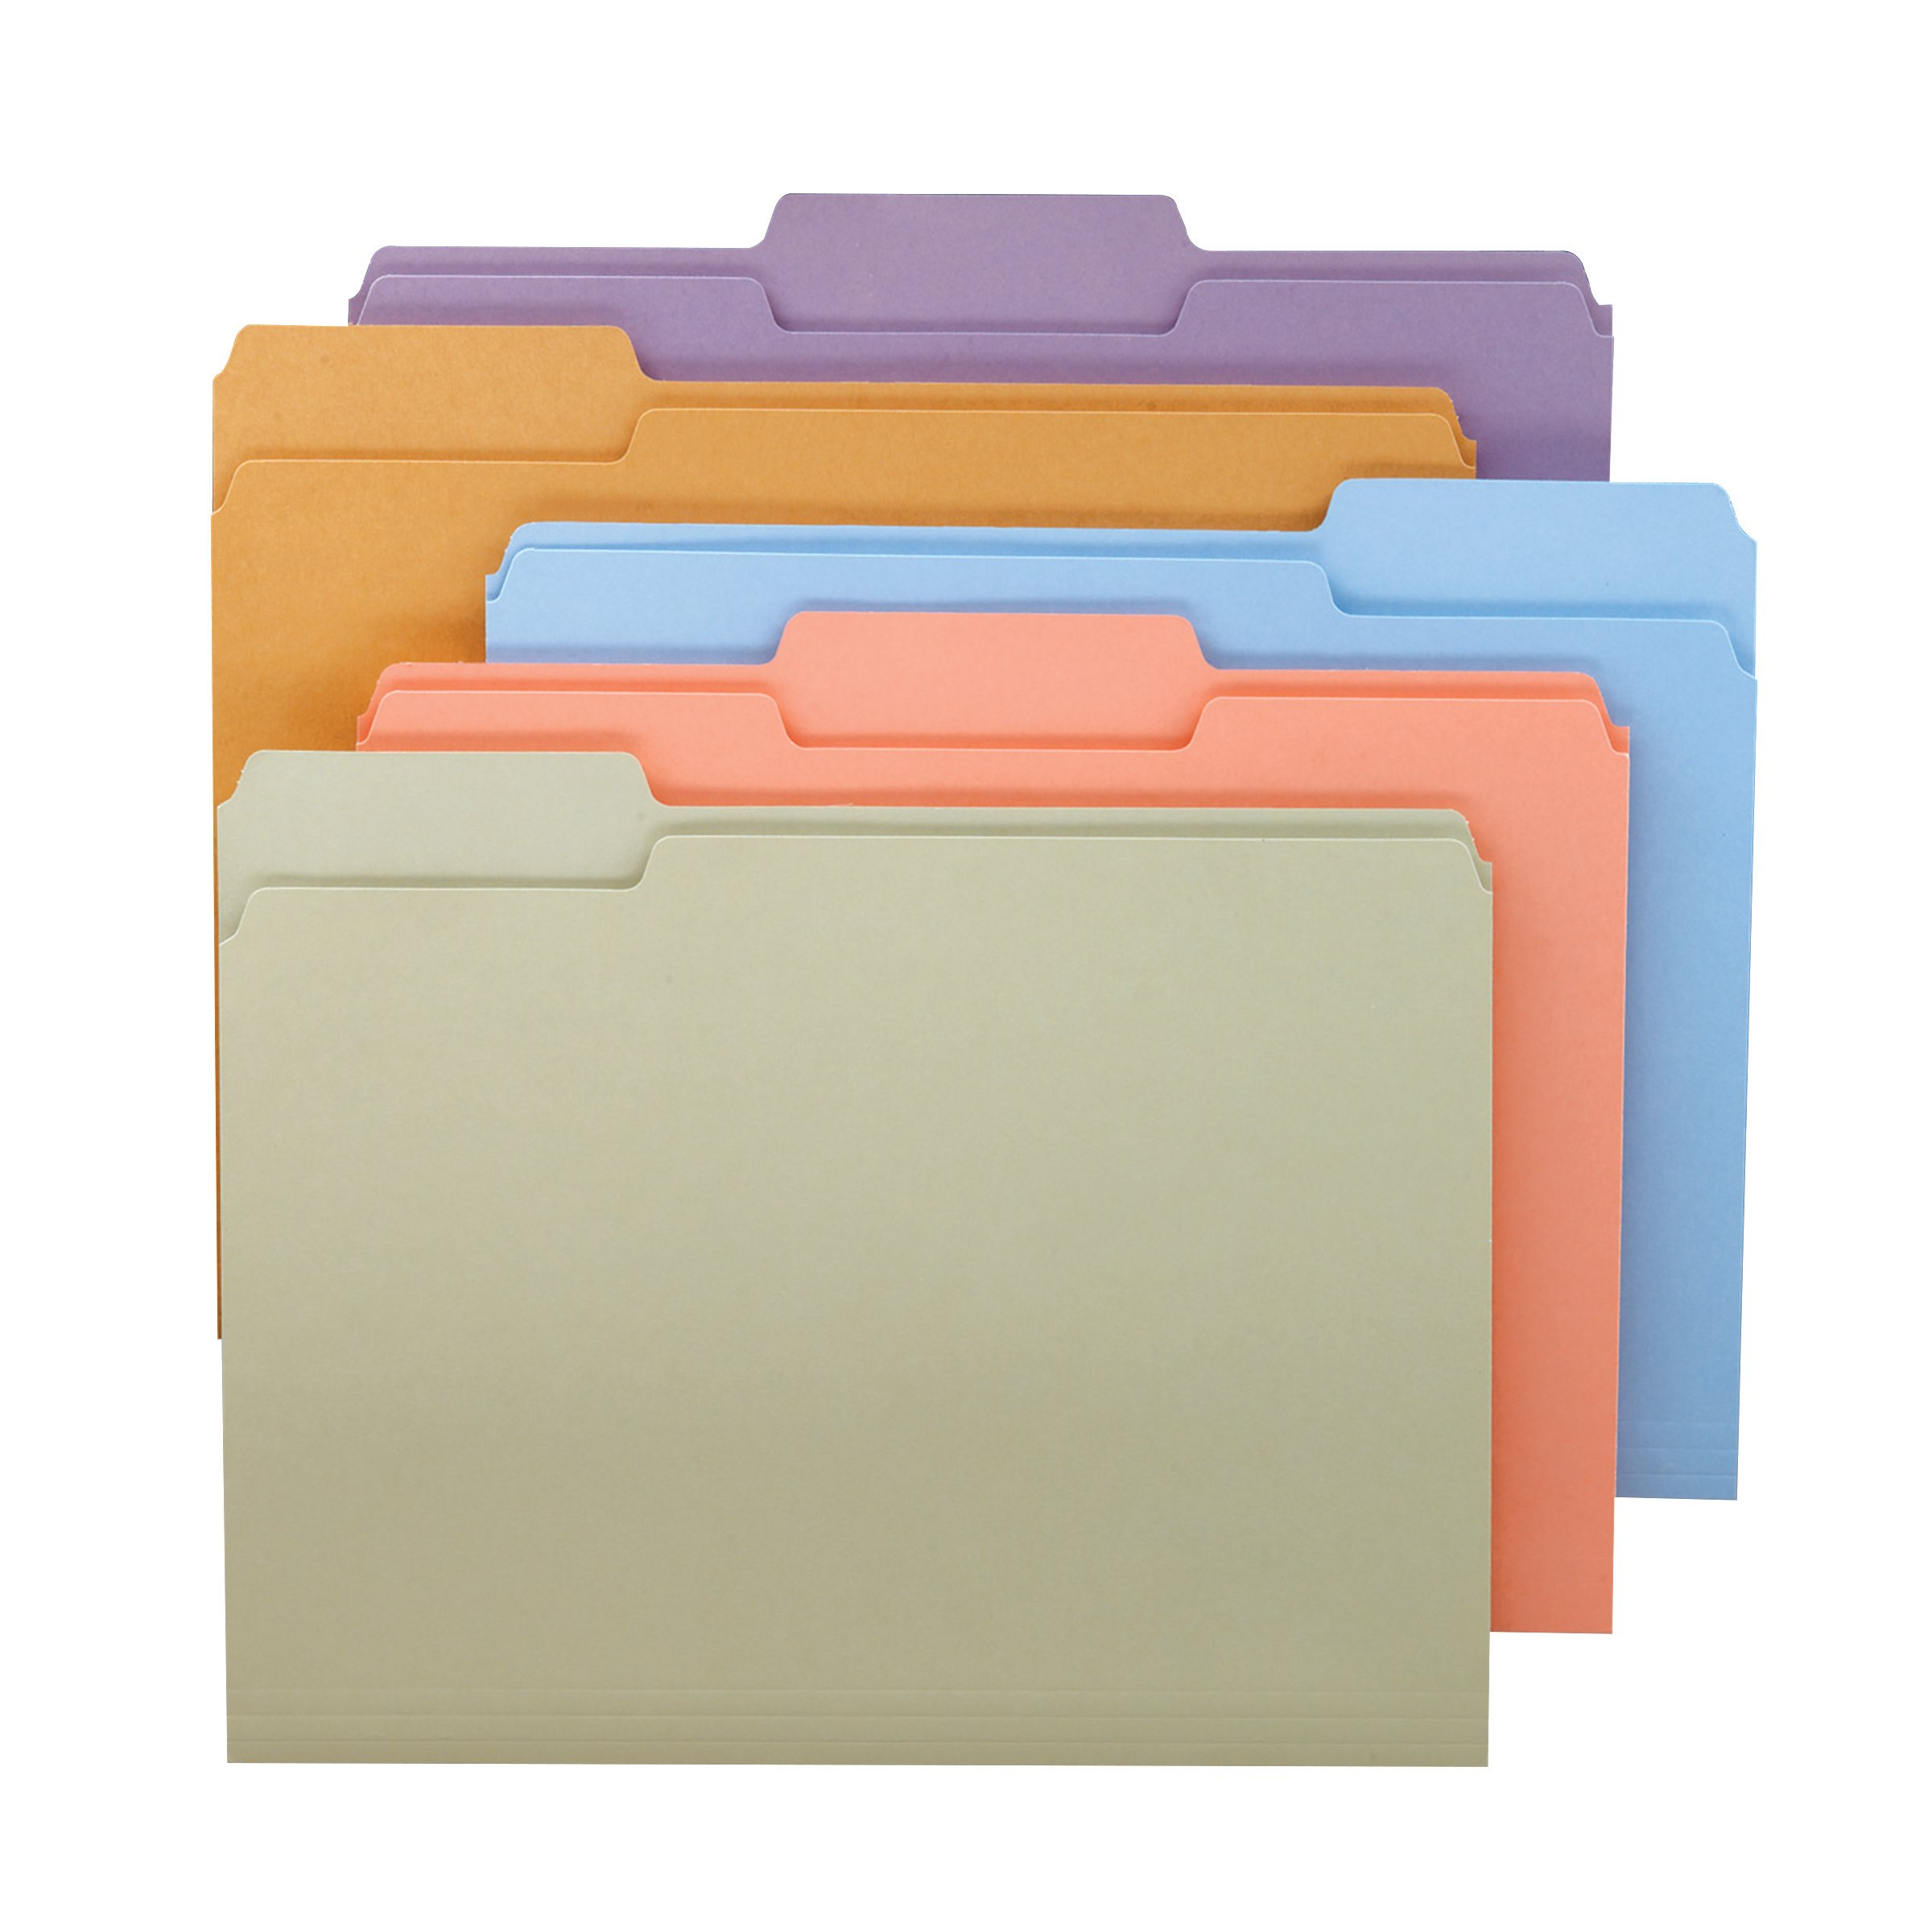 Smead File Folder, 1/3-Cut Tab, Letter Size, Assorted Colors, 100 per Box, (11953)